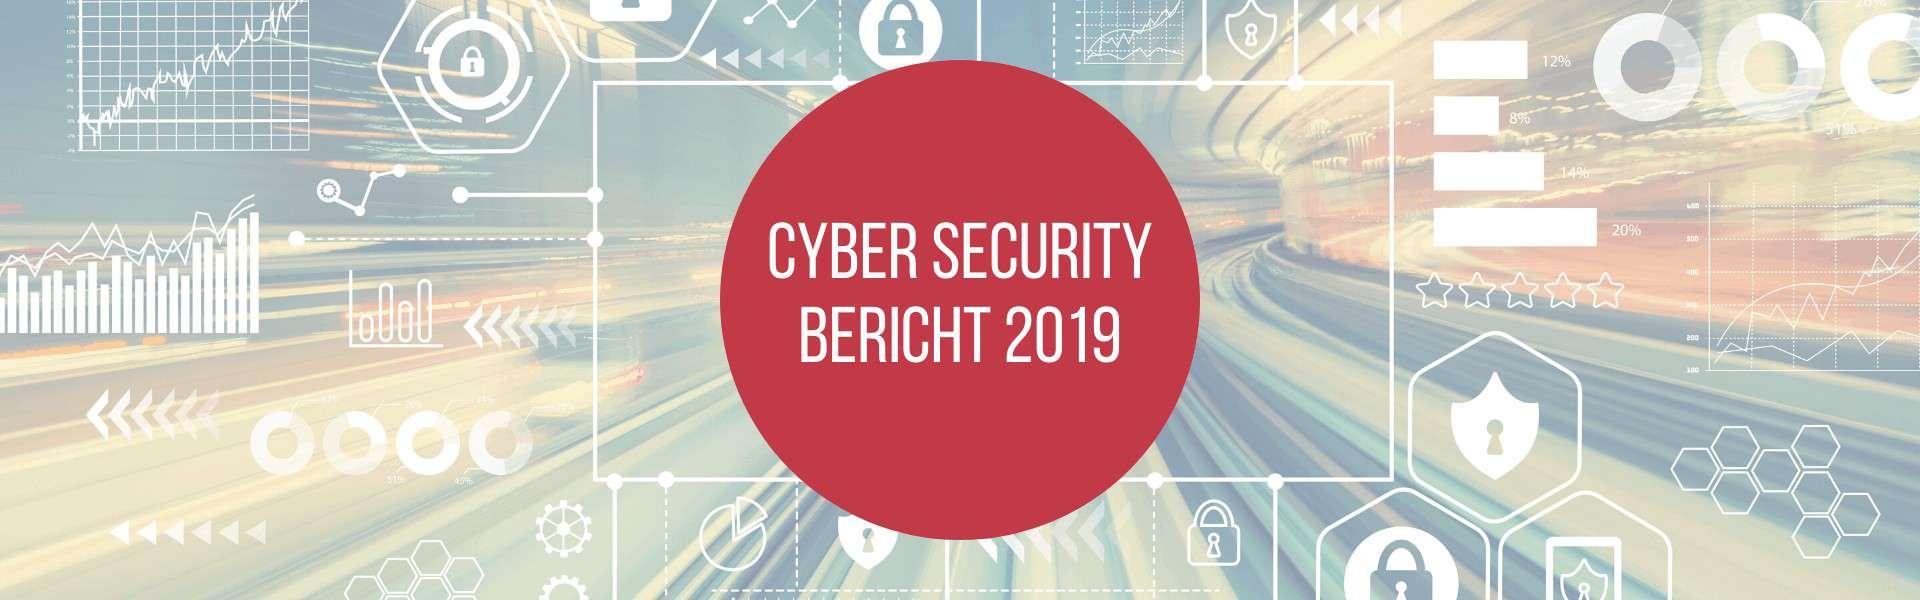 Cyber Security Bericht, Cyber Security Bericht 2019